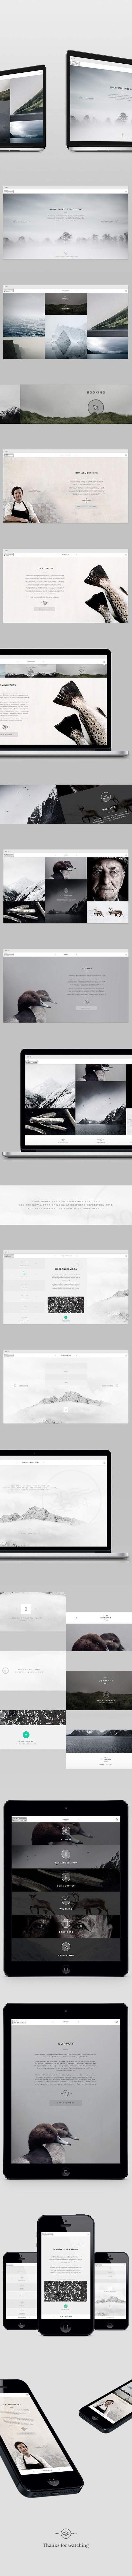 (1) Pin de dub__b__u en Web / Interaction | Pinterest